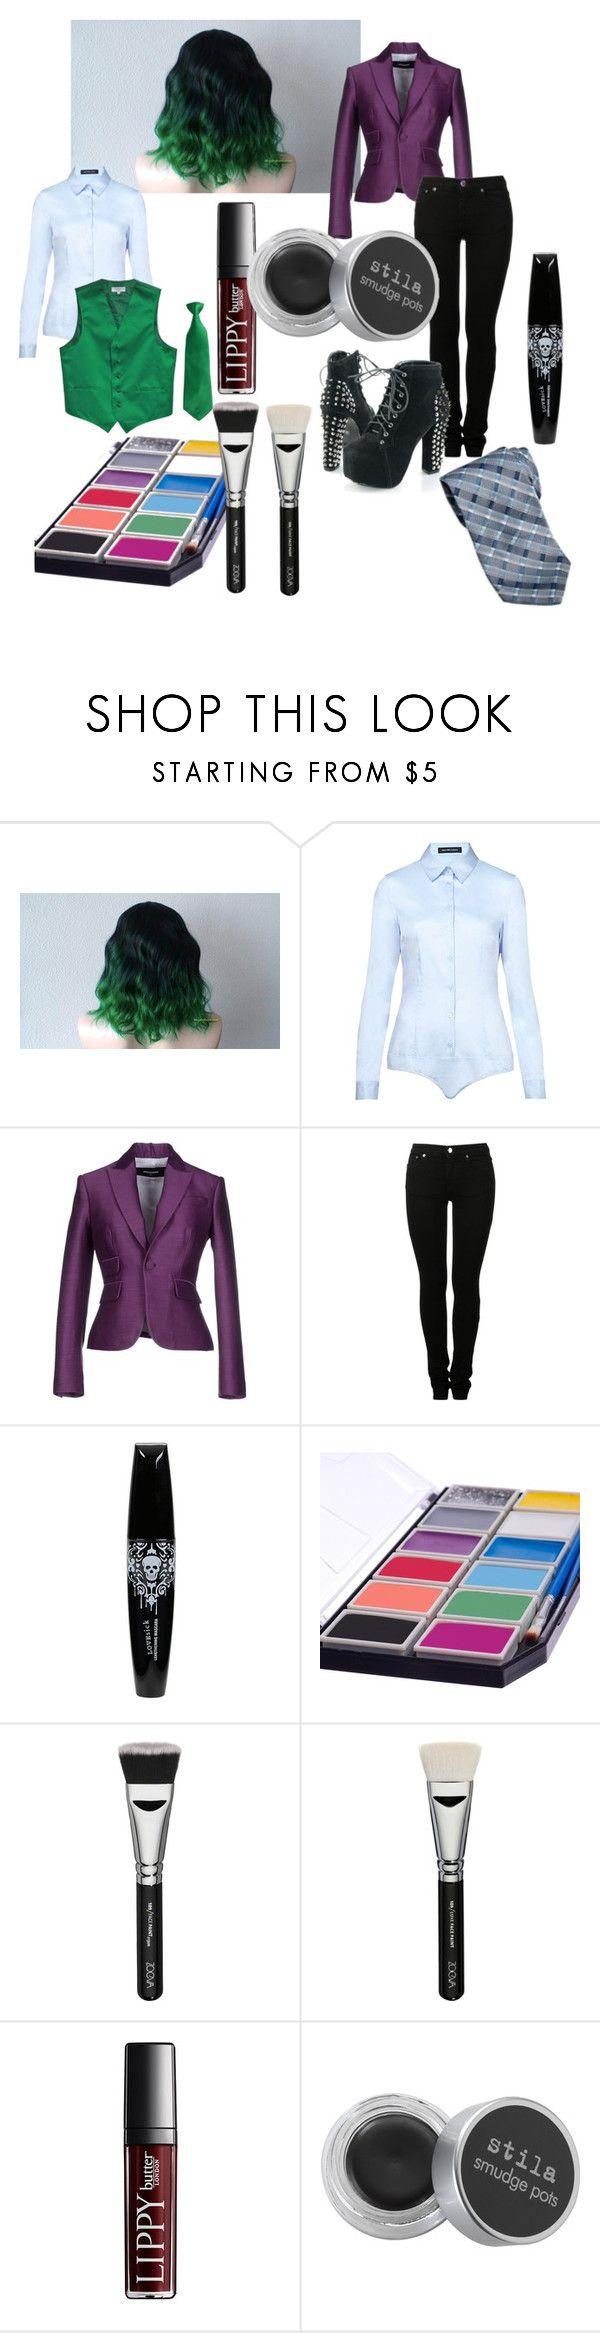 """Female Joker"" by michaela-388 on Polyvore featuring Hallhuber, Dsquared2, MM6 Maison Margiela, ZOEVA and Stila"